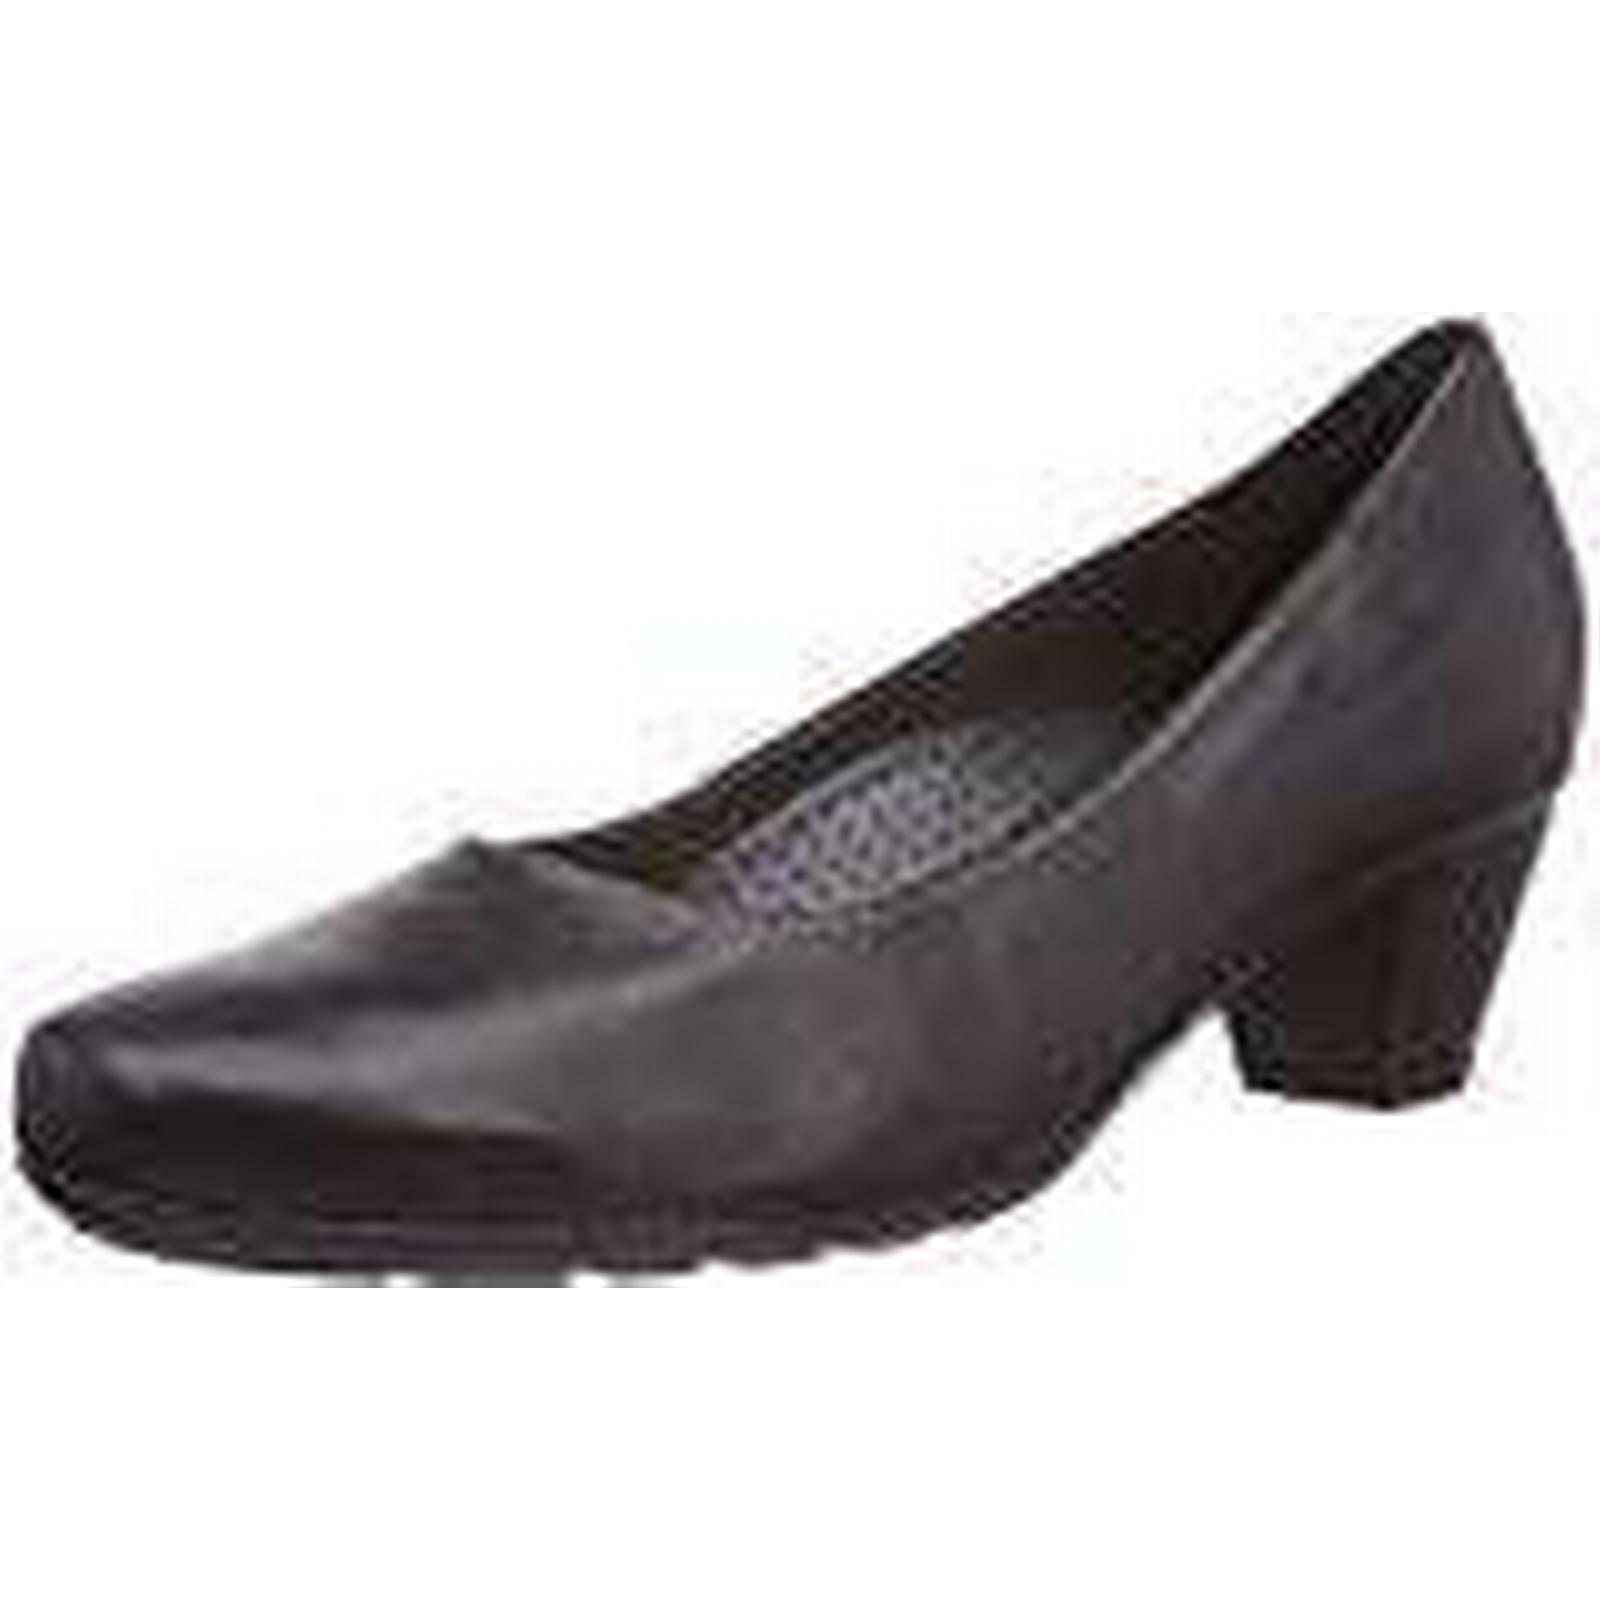 Gabor, Women's, Brambling, Closed-Toe Pumps Leather), & Heels, Black (Black Leather), Pumps 42.5 EU c3a883